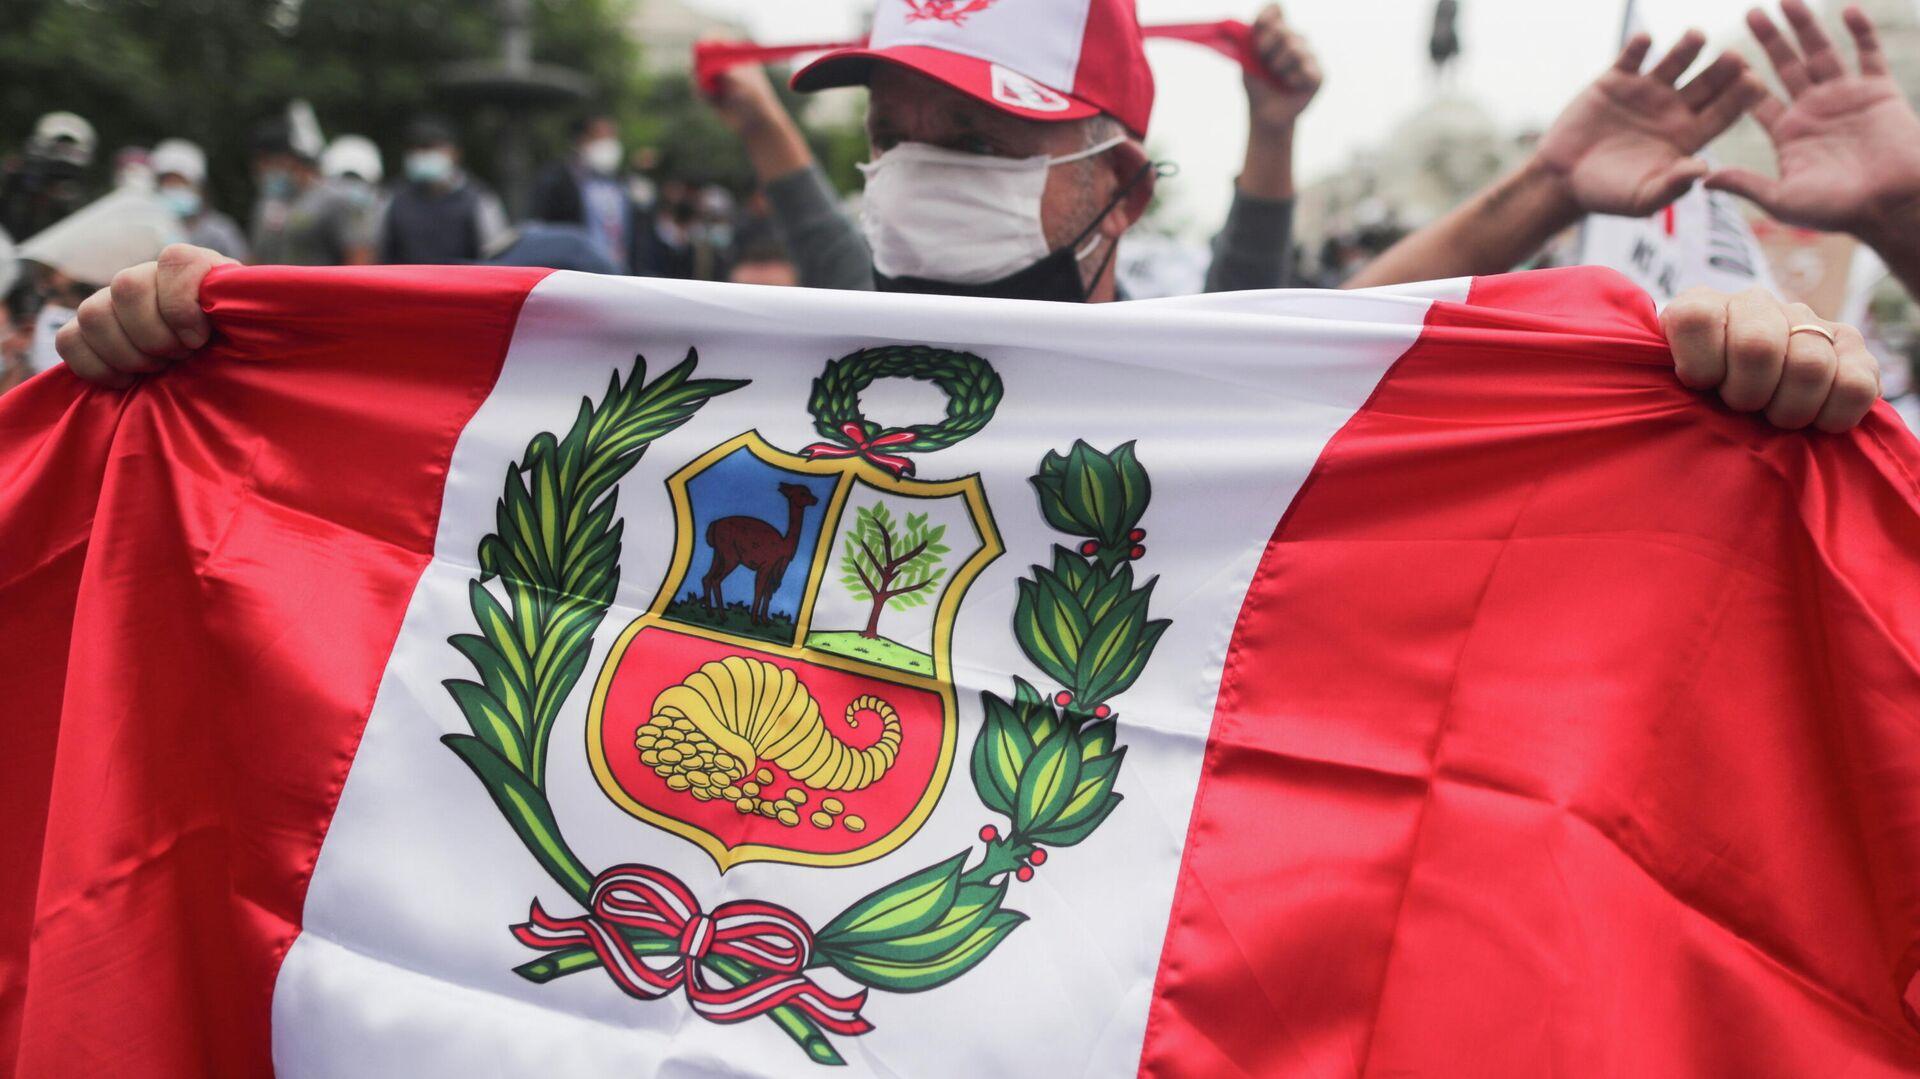 Un manifestante con la bandera peruana en Lima - Sputnik Mundo, 1920, 04.06.2021